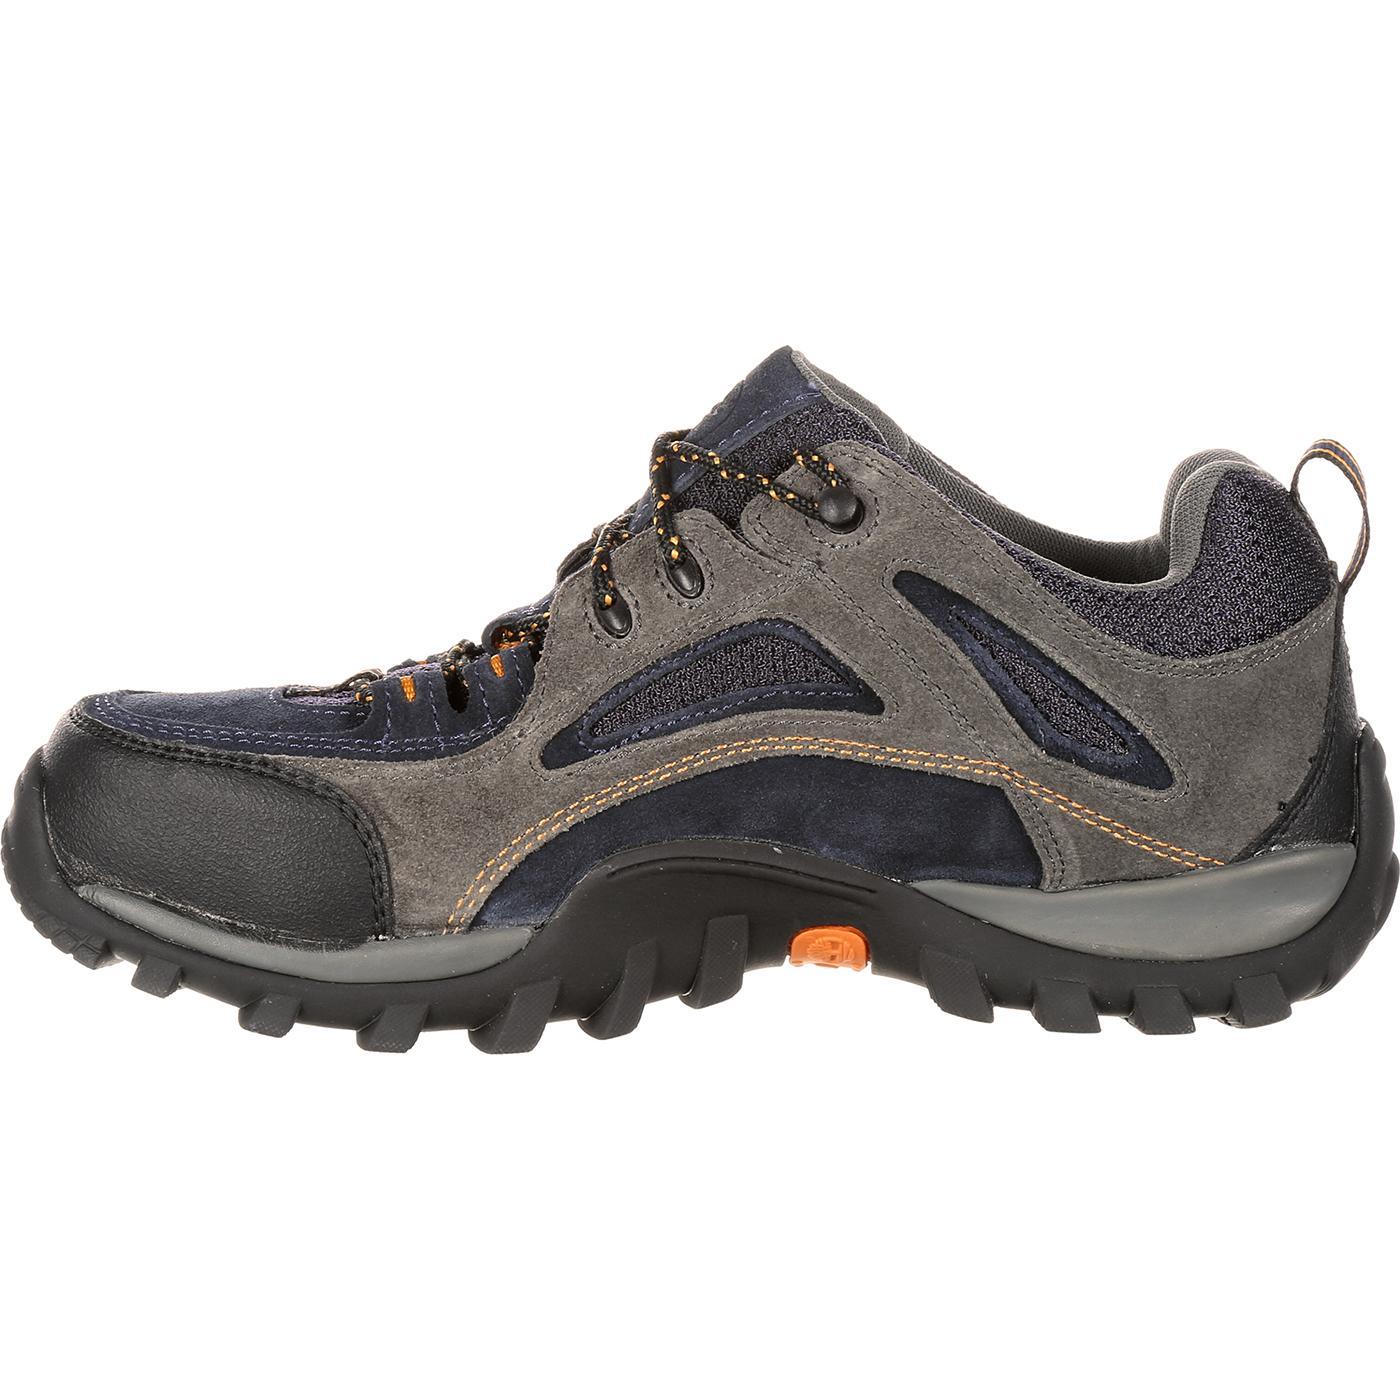 Timberland PRO Steel Toe LoCut Hiker Work Shoes #61009